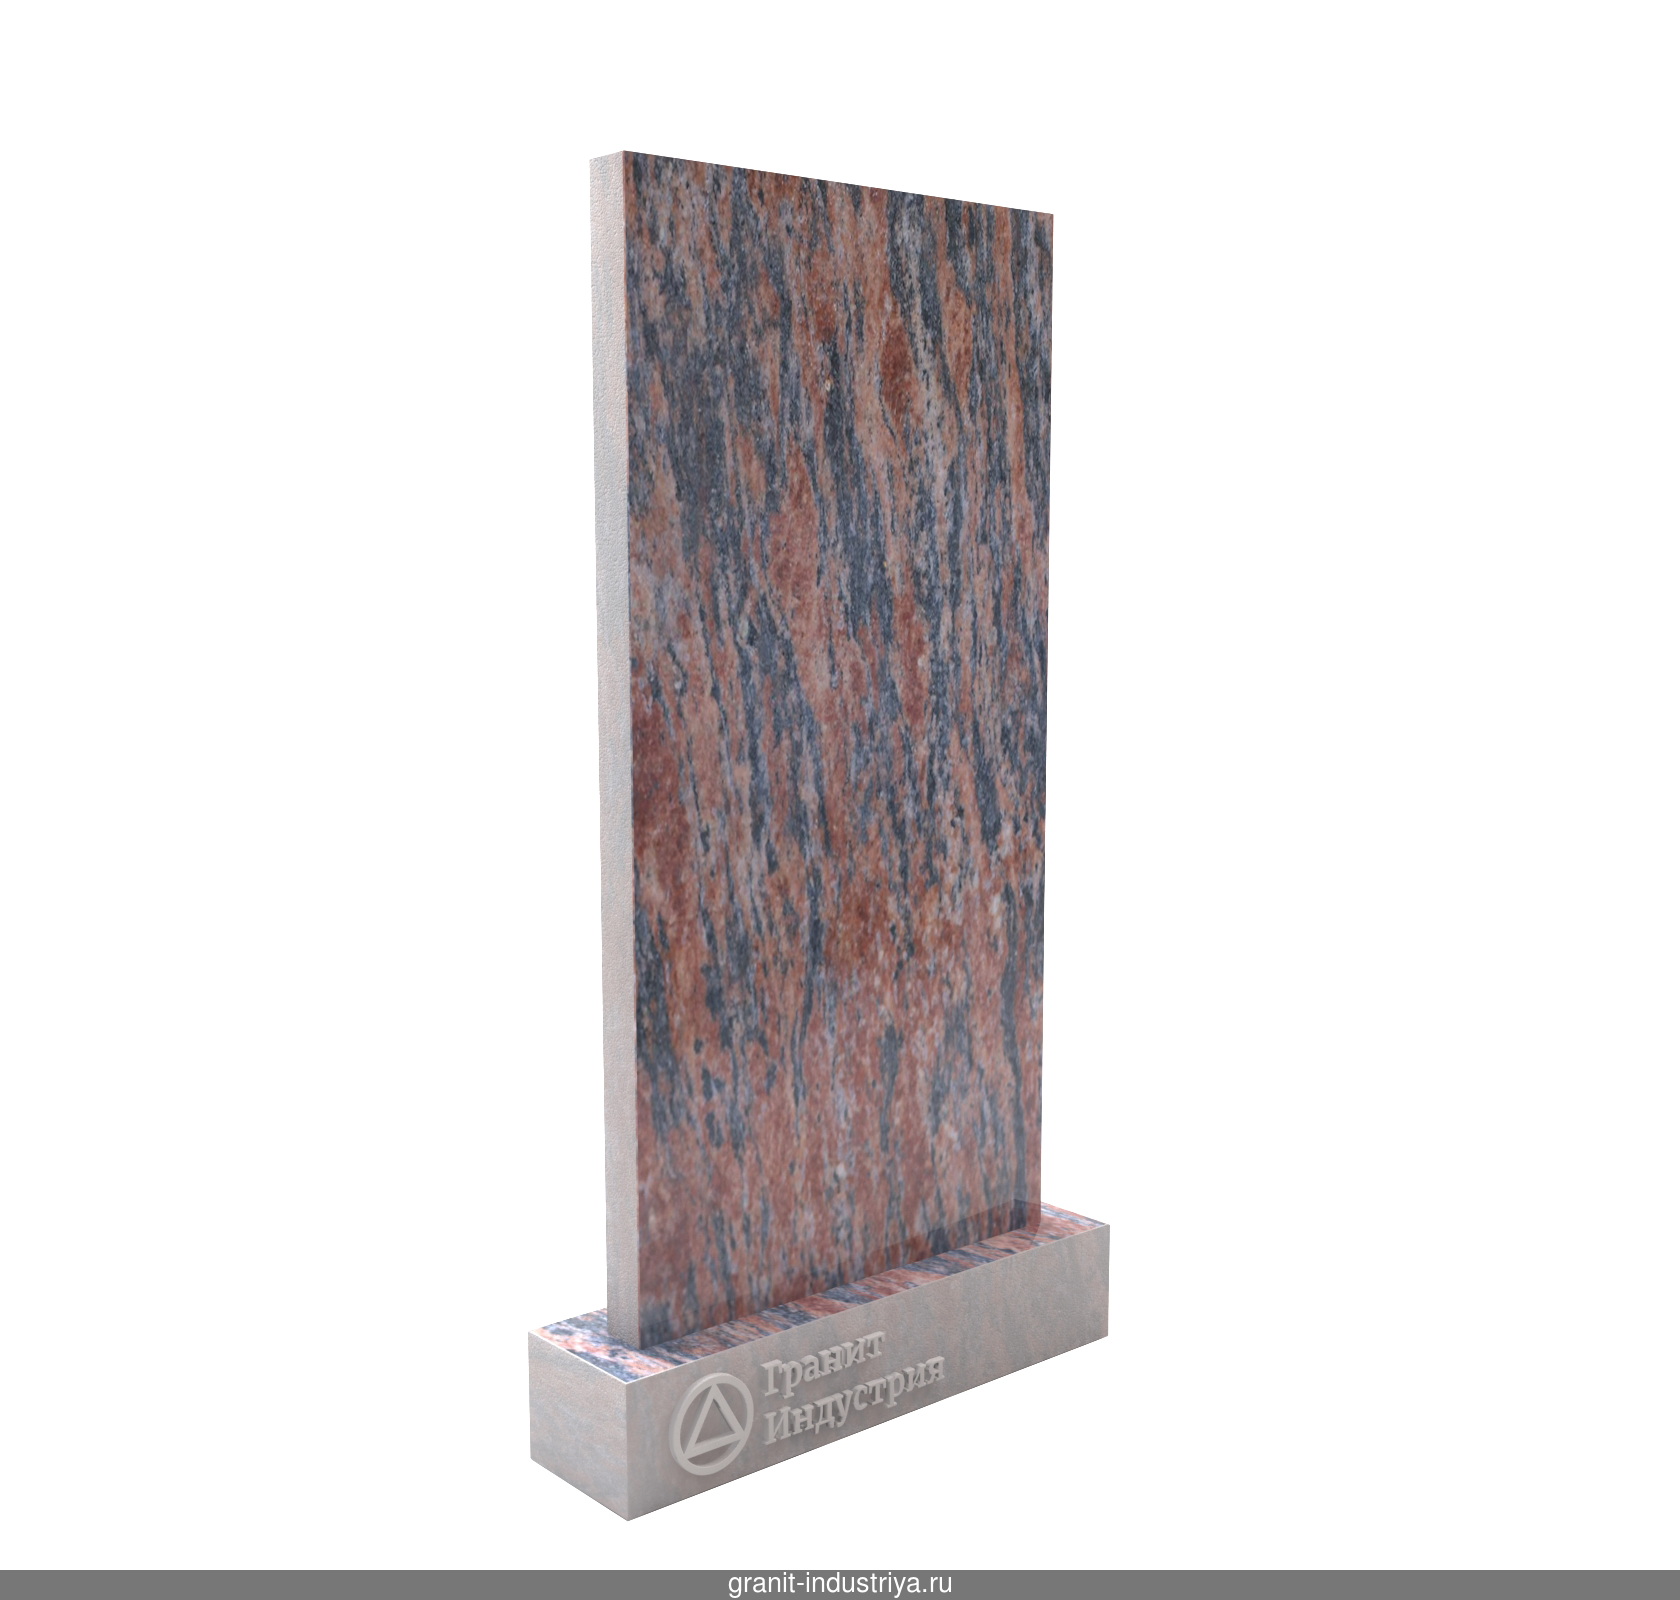 Памятник из гранита Калгуваара, арт. 6436